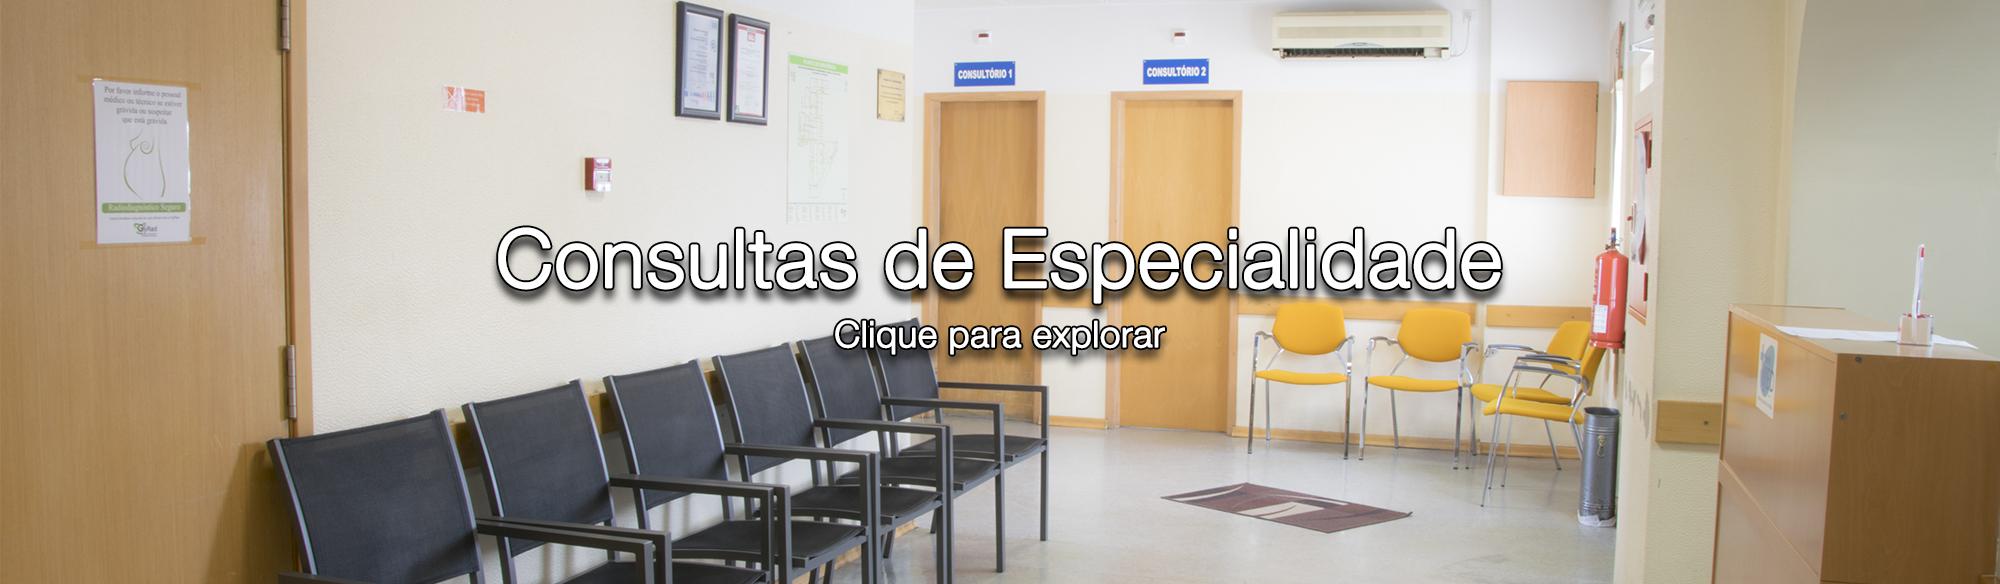 Cardiologia, Fisioterapia, Dermatologia, Dietética, Imunoalergologia, Medicina Dentária, Neurologia, Nutrição, Ortopedia, Reumatologia, Oftalmologia